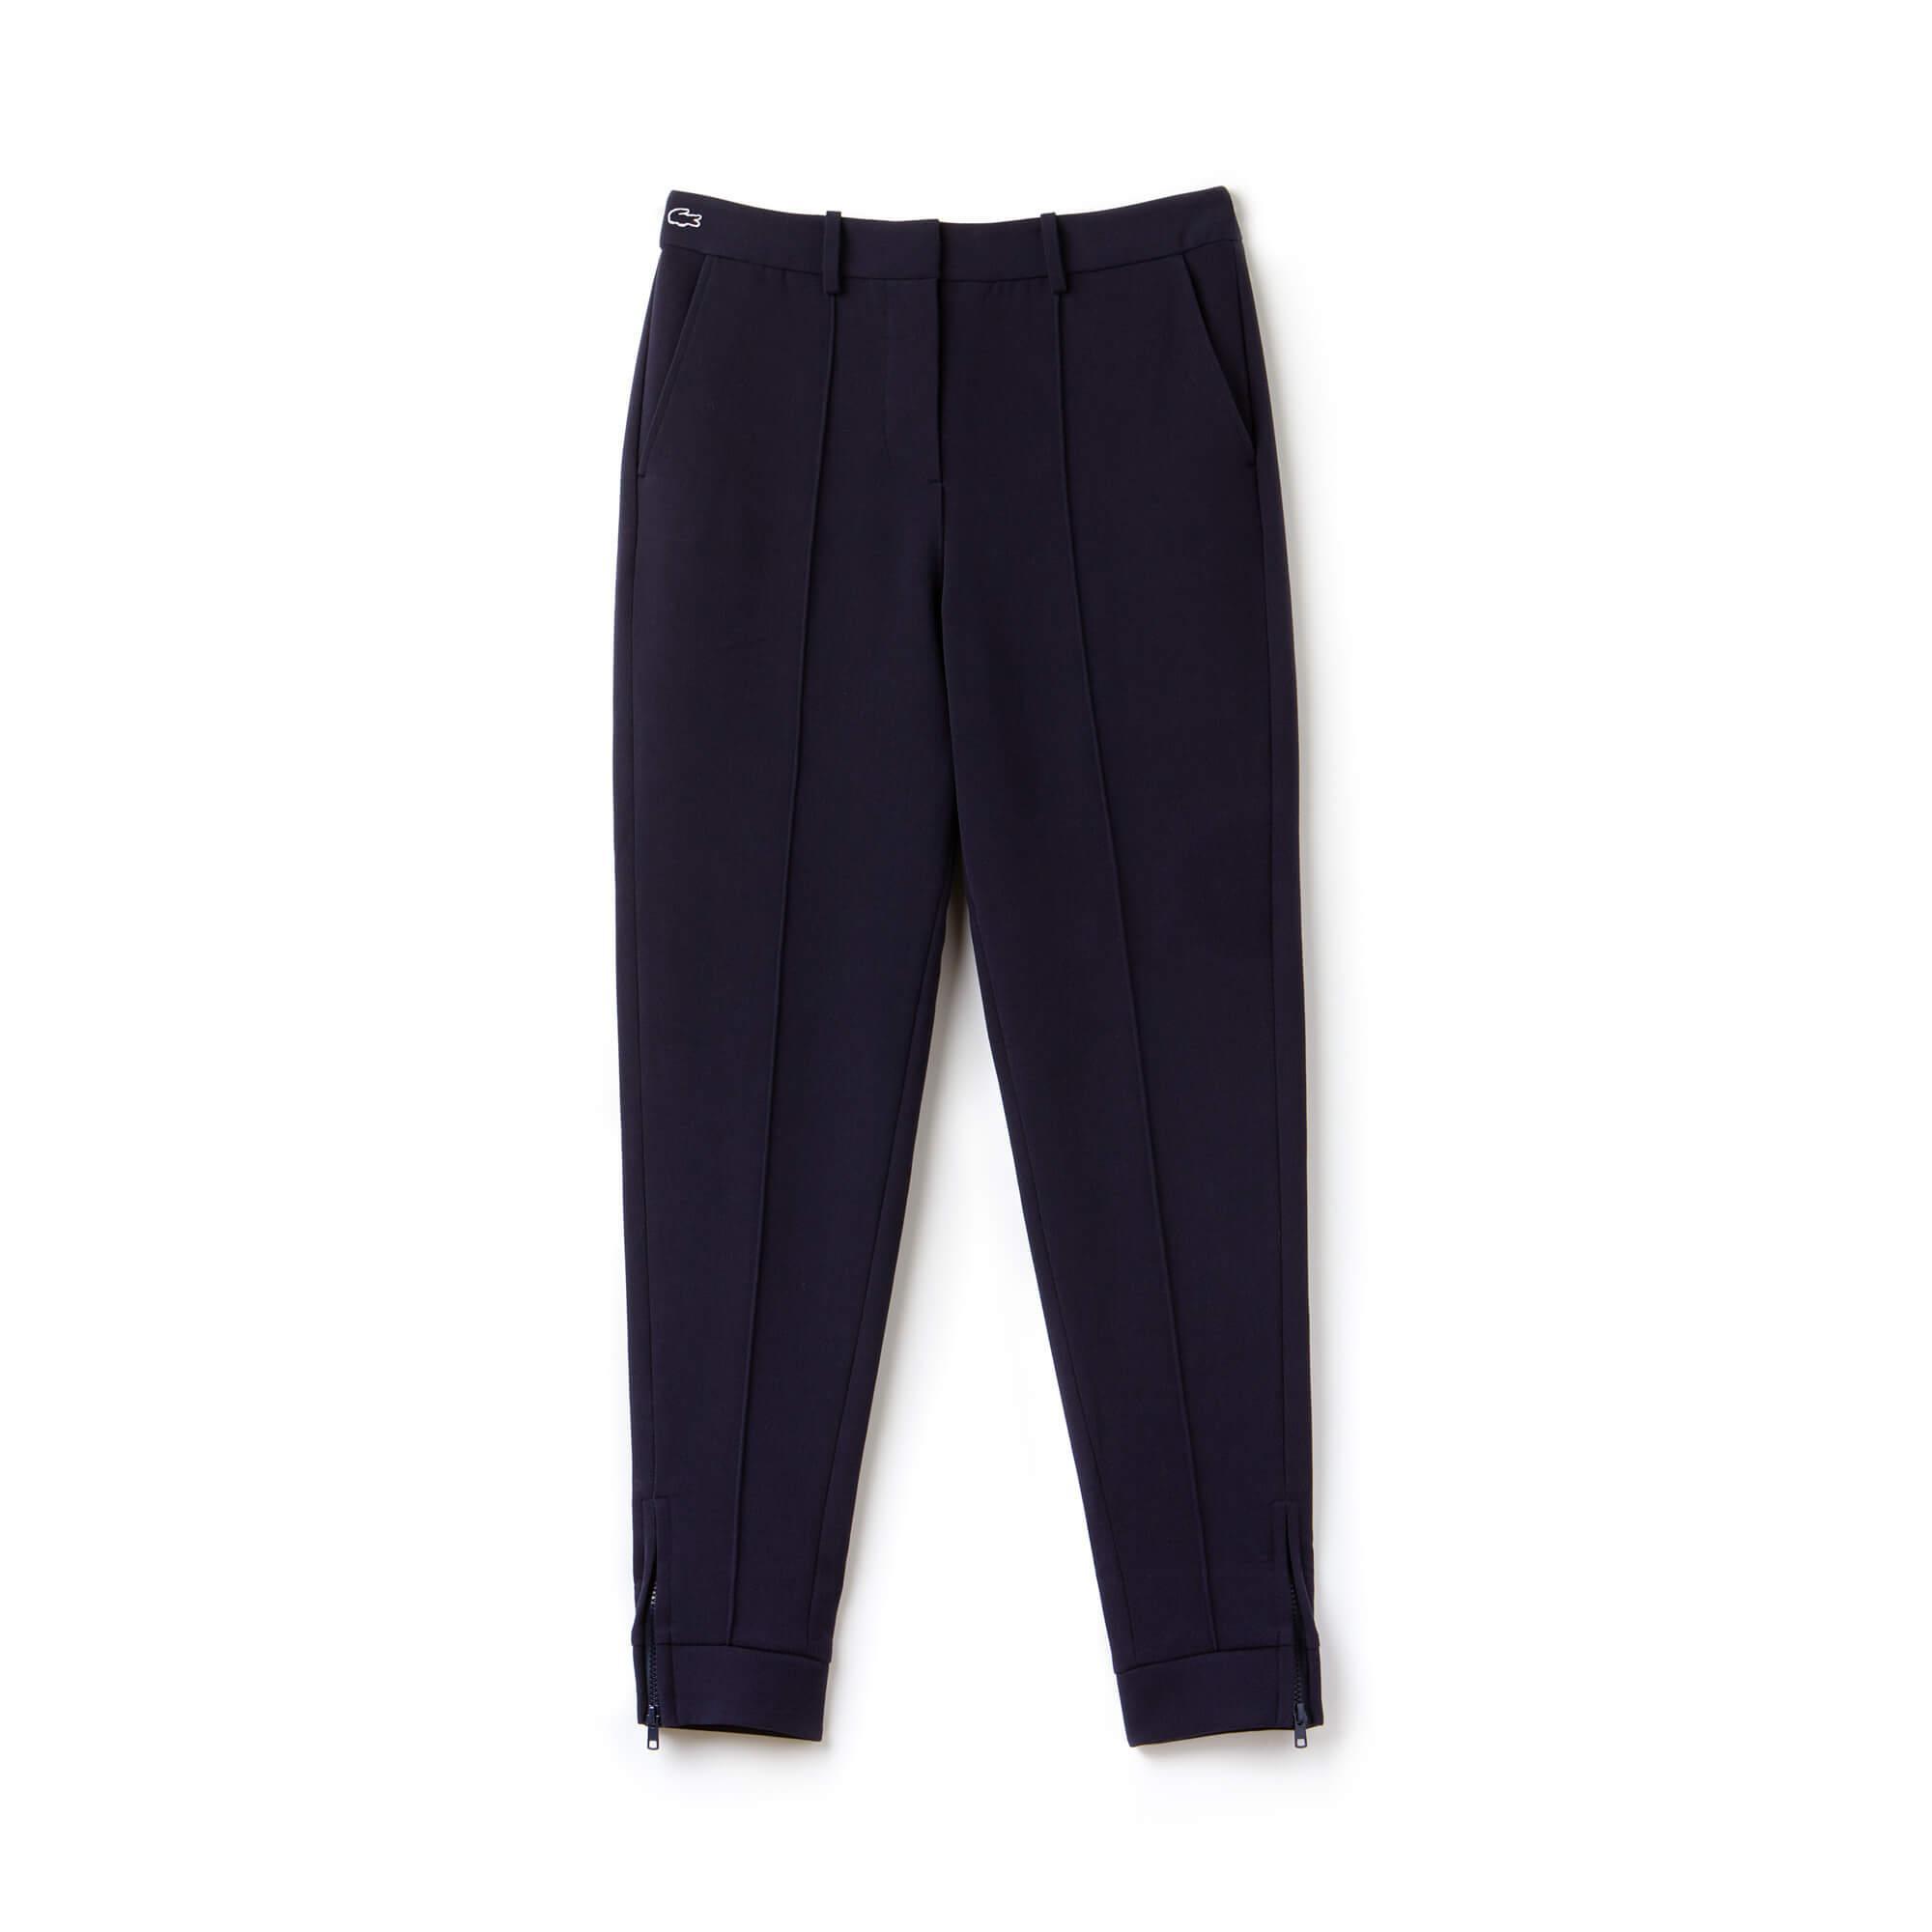 Lacoste Damskie Spodnie